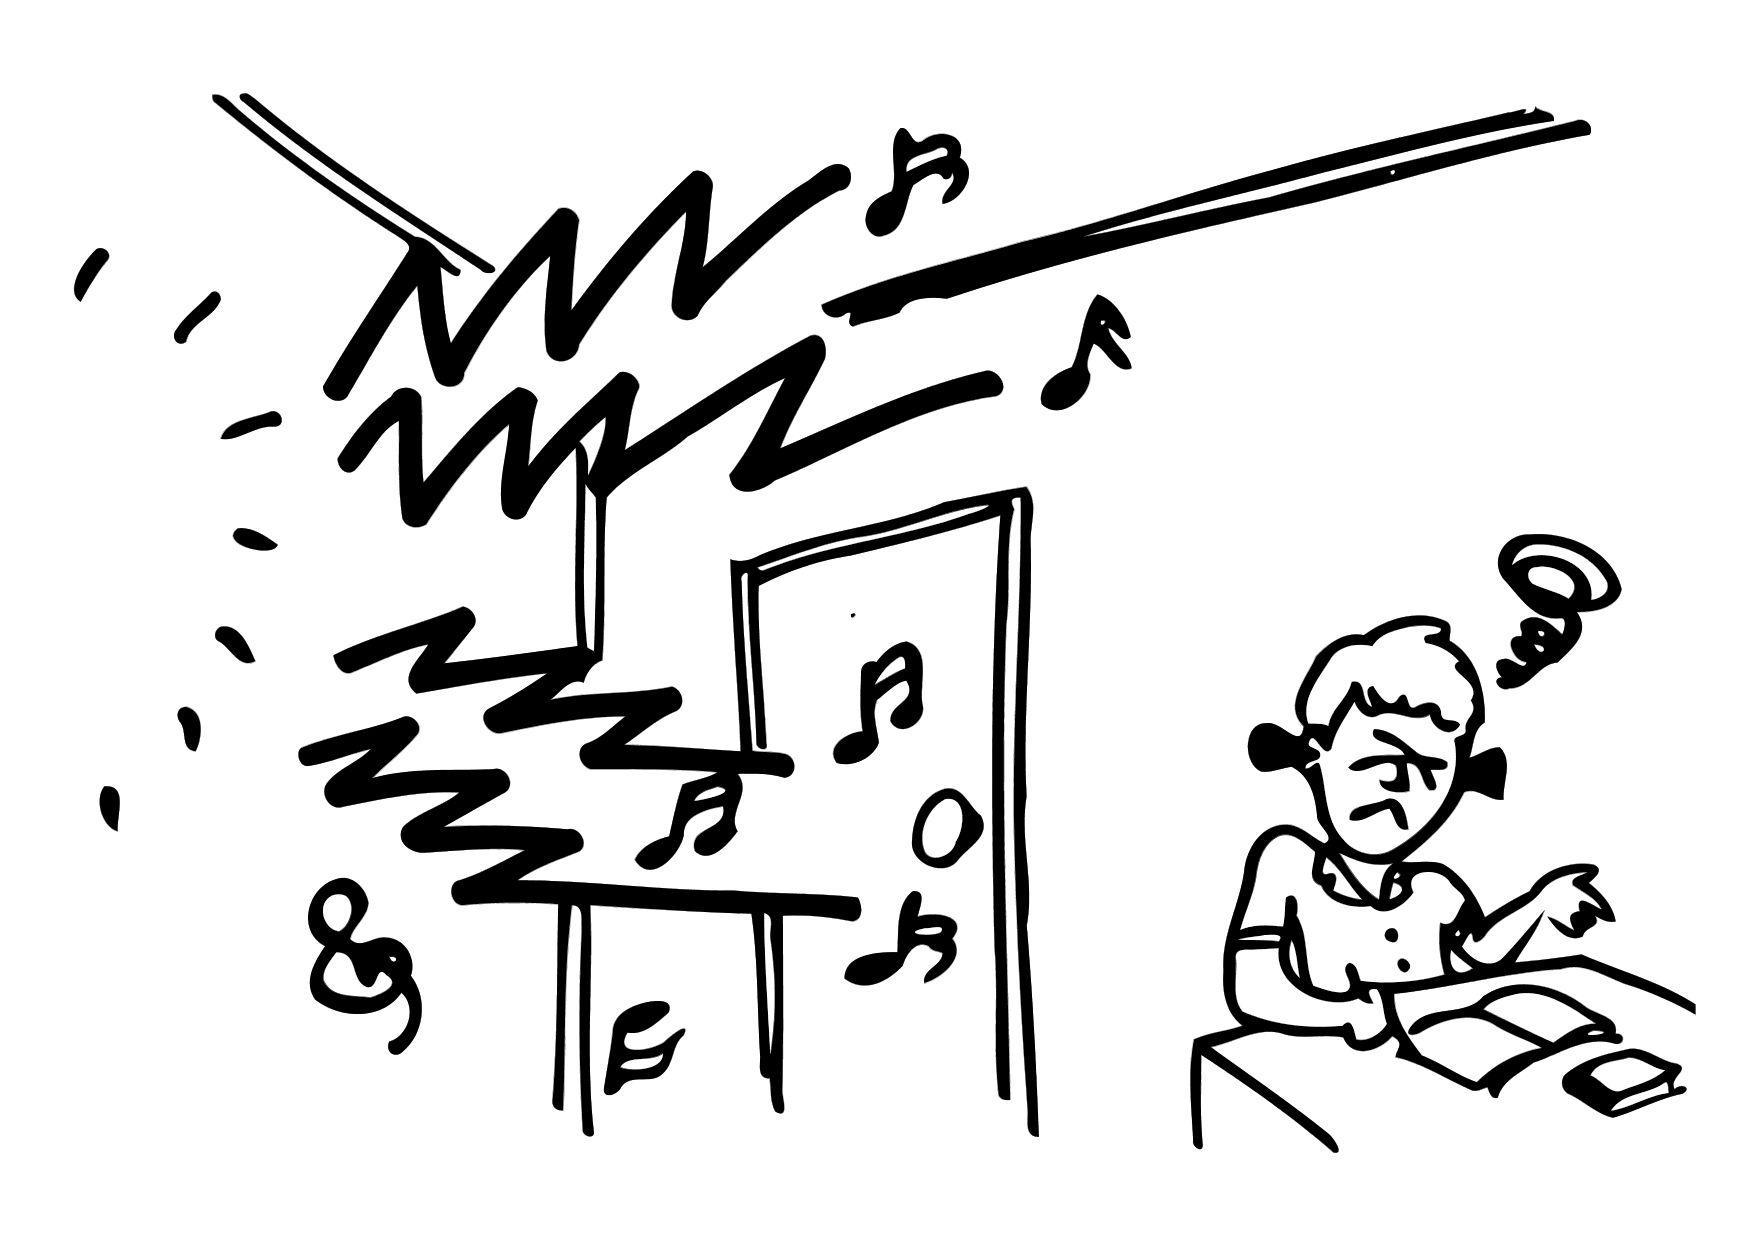 Malvorlage Lärm - lernen | Ausmalbild 12150.